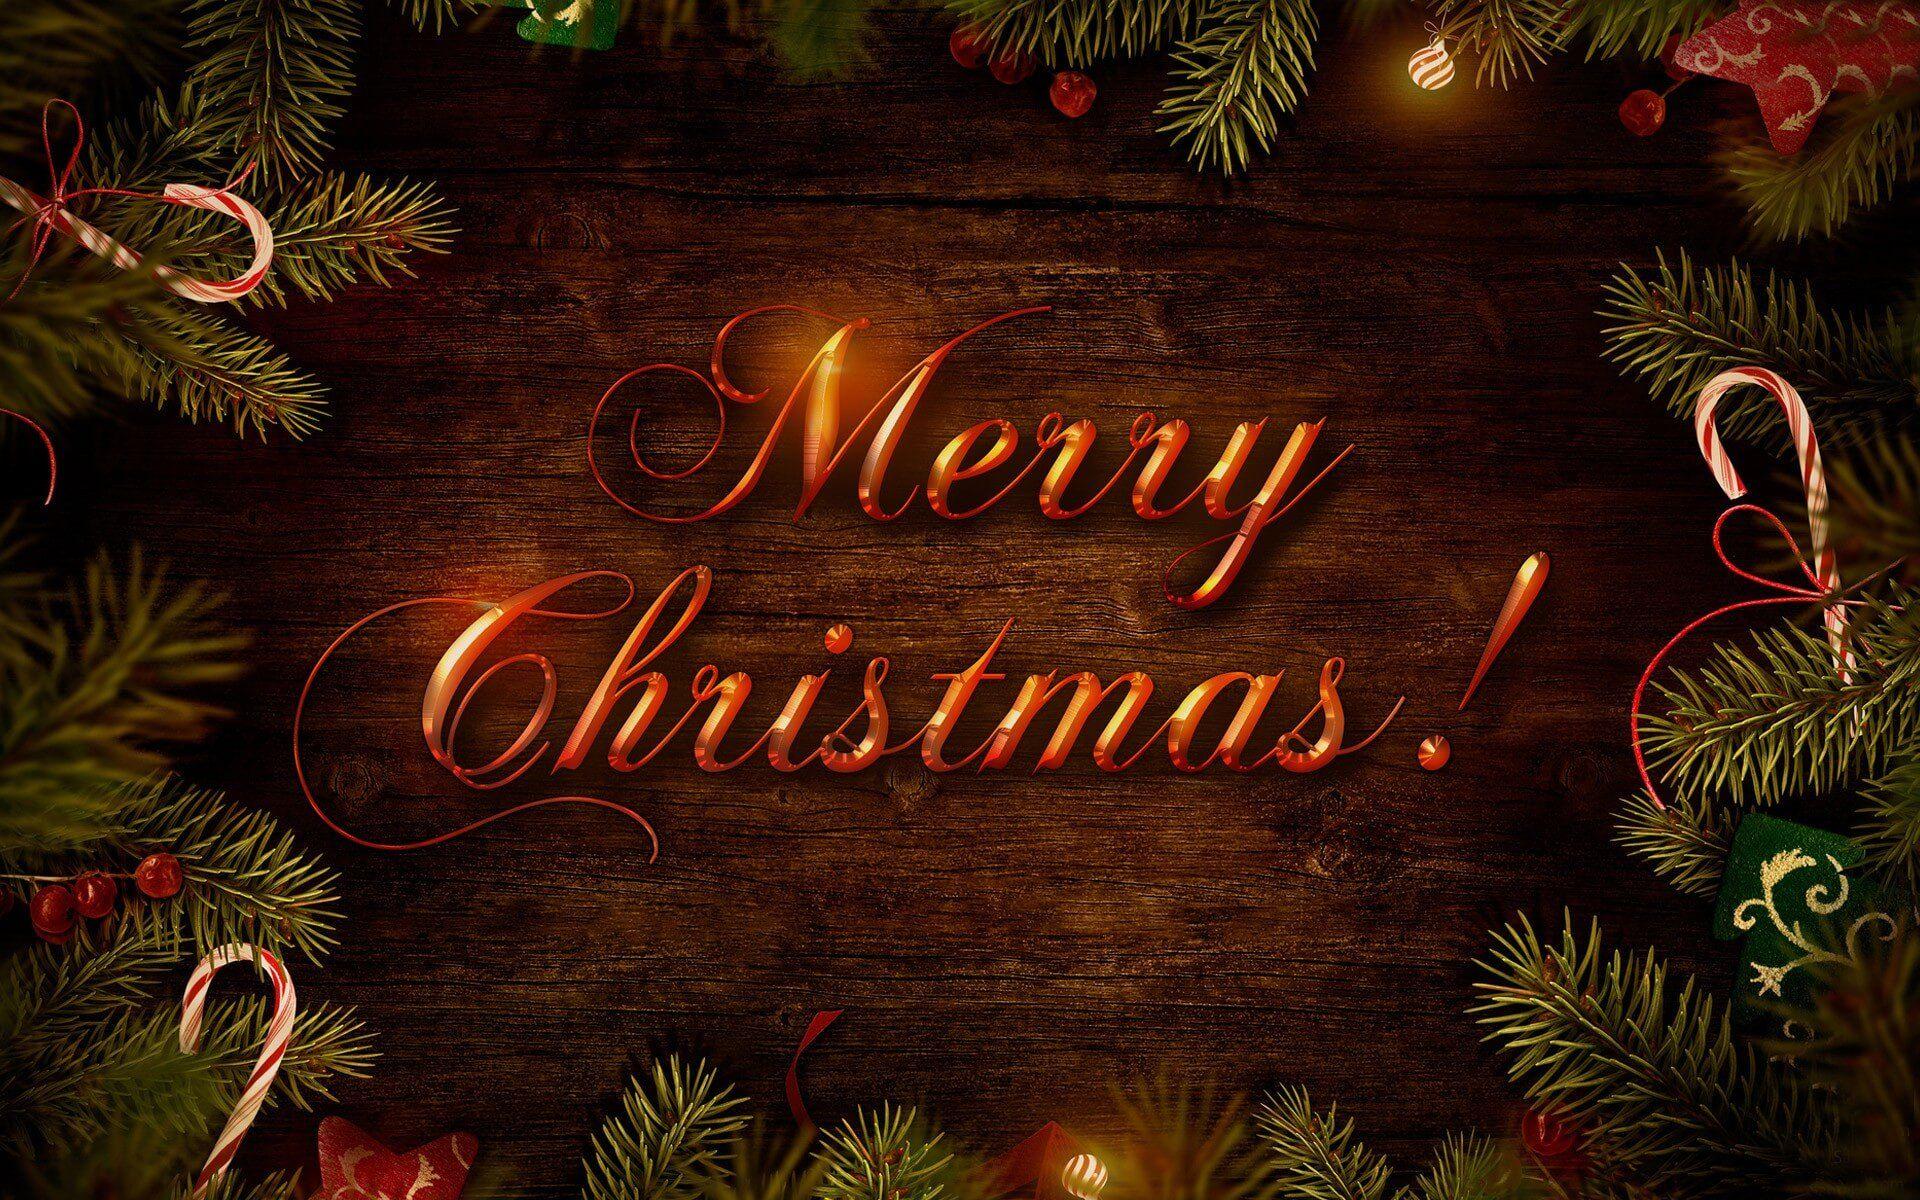 Christmas Whatsapp Status Merry Christmas Quotes Christmas Hd Images Funny Christmas Wa Merry Christmas Wallpaper Christmas Desktop Christmas Desktop Wallpaper